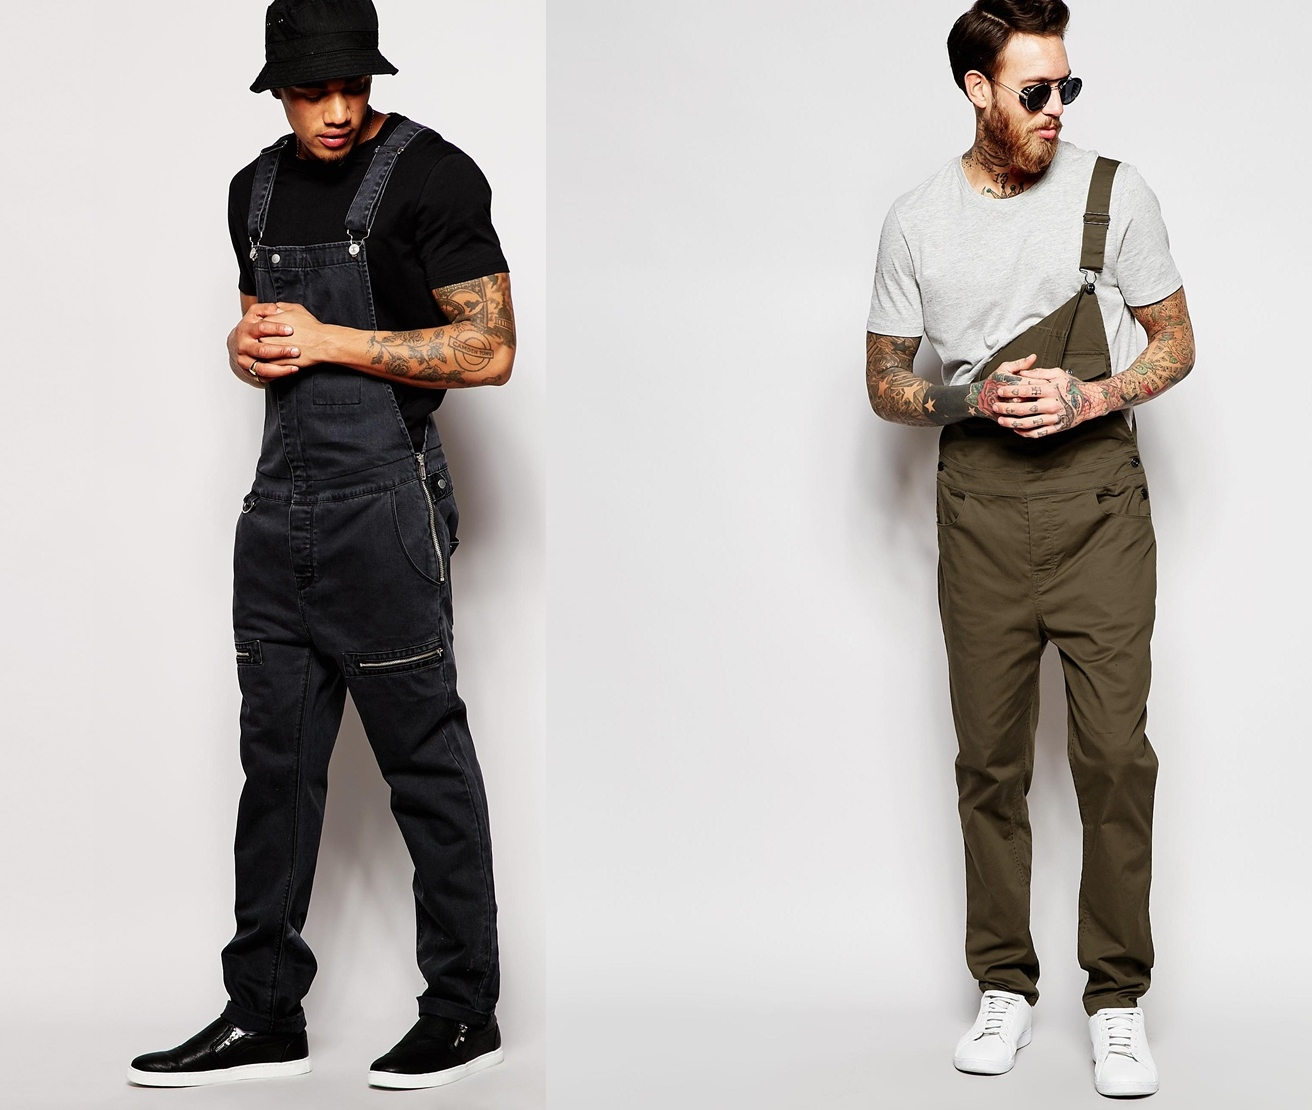 macacão masculino, overalls, look masculino, outfit, outfit of the day, estilo, roupa masculina, moda masculina, dicas de moda, alex cursino, moda sem censura, fashion tips, (2)